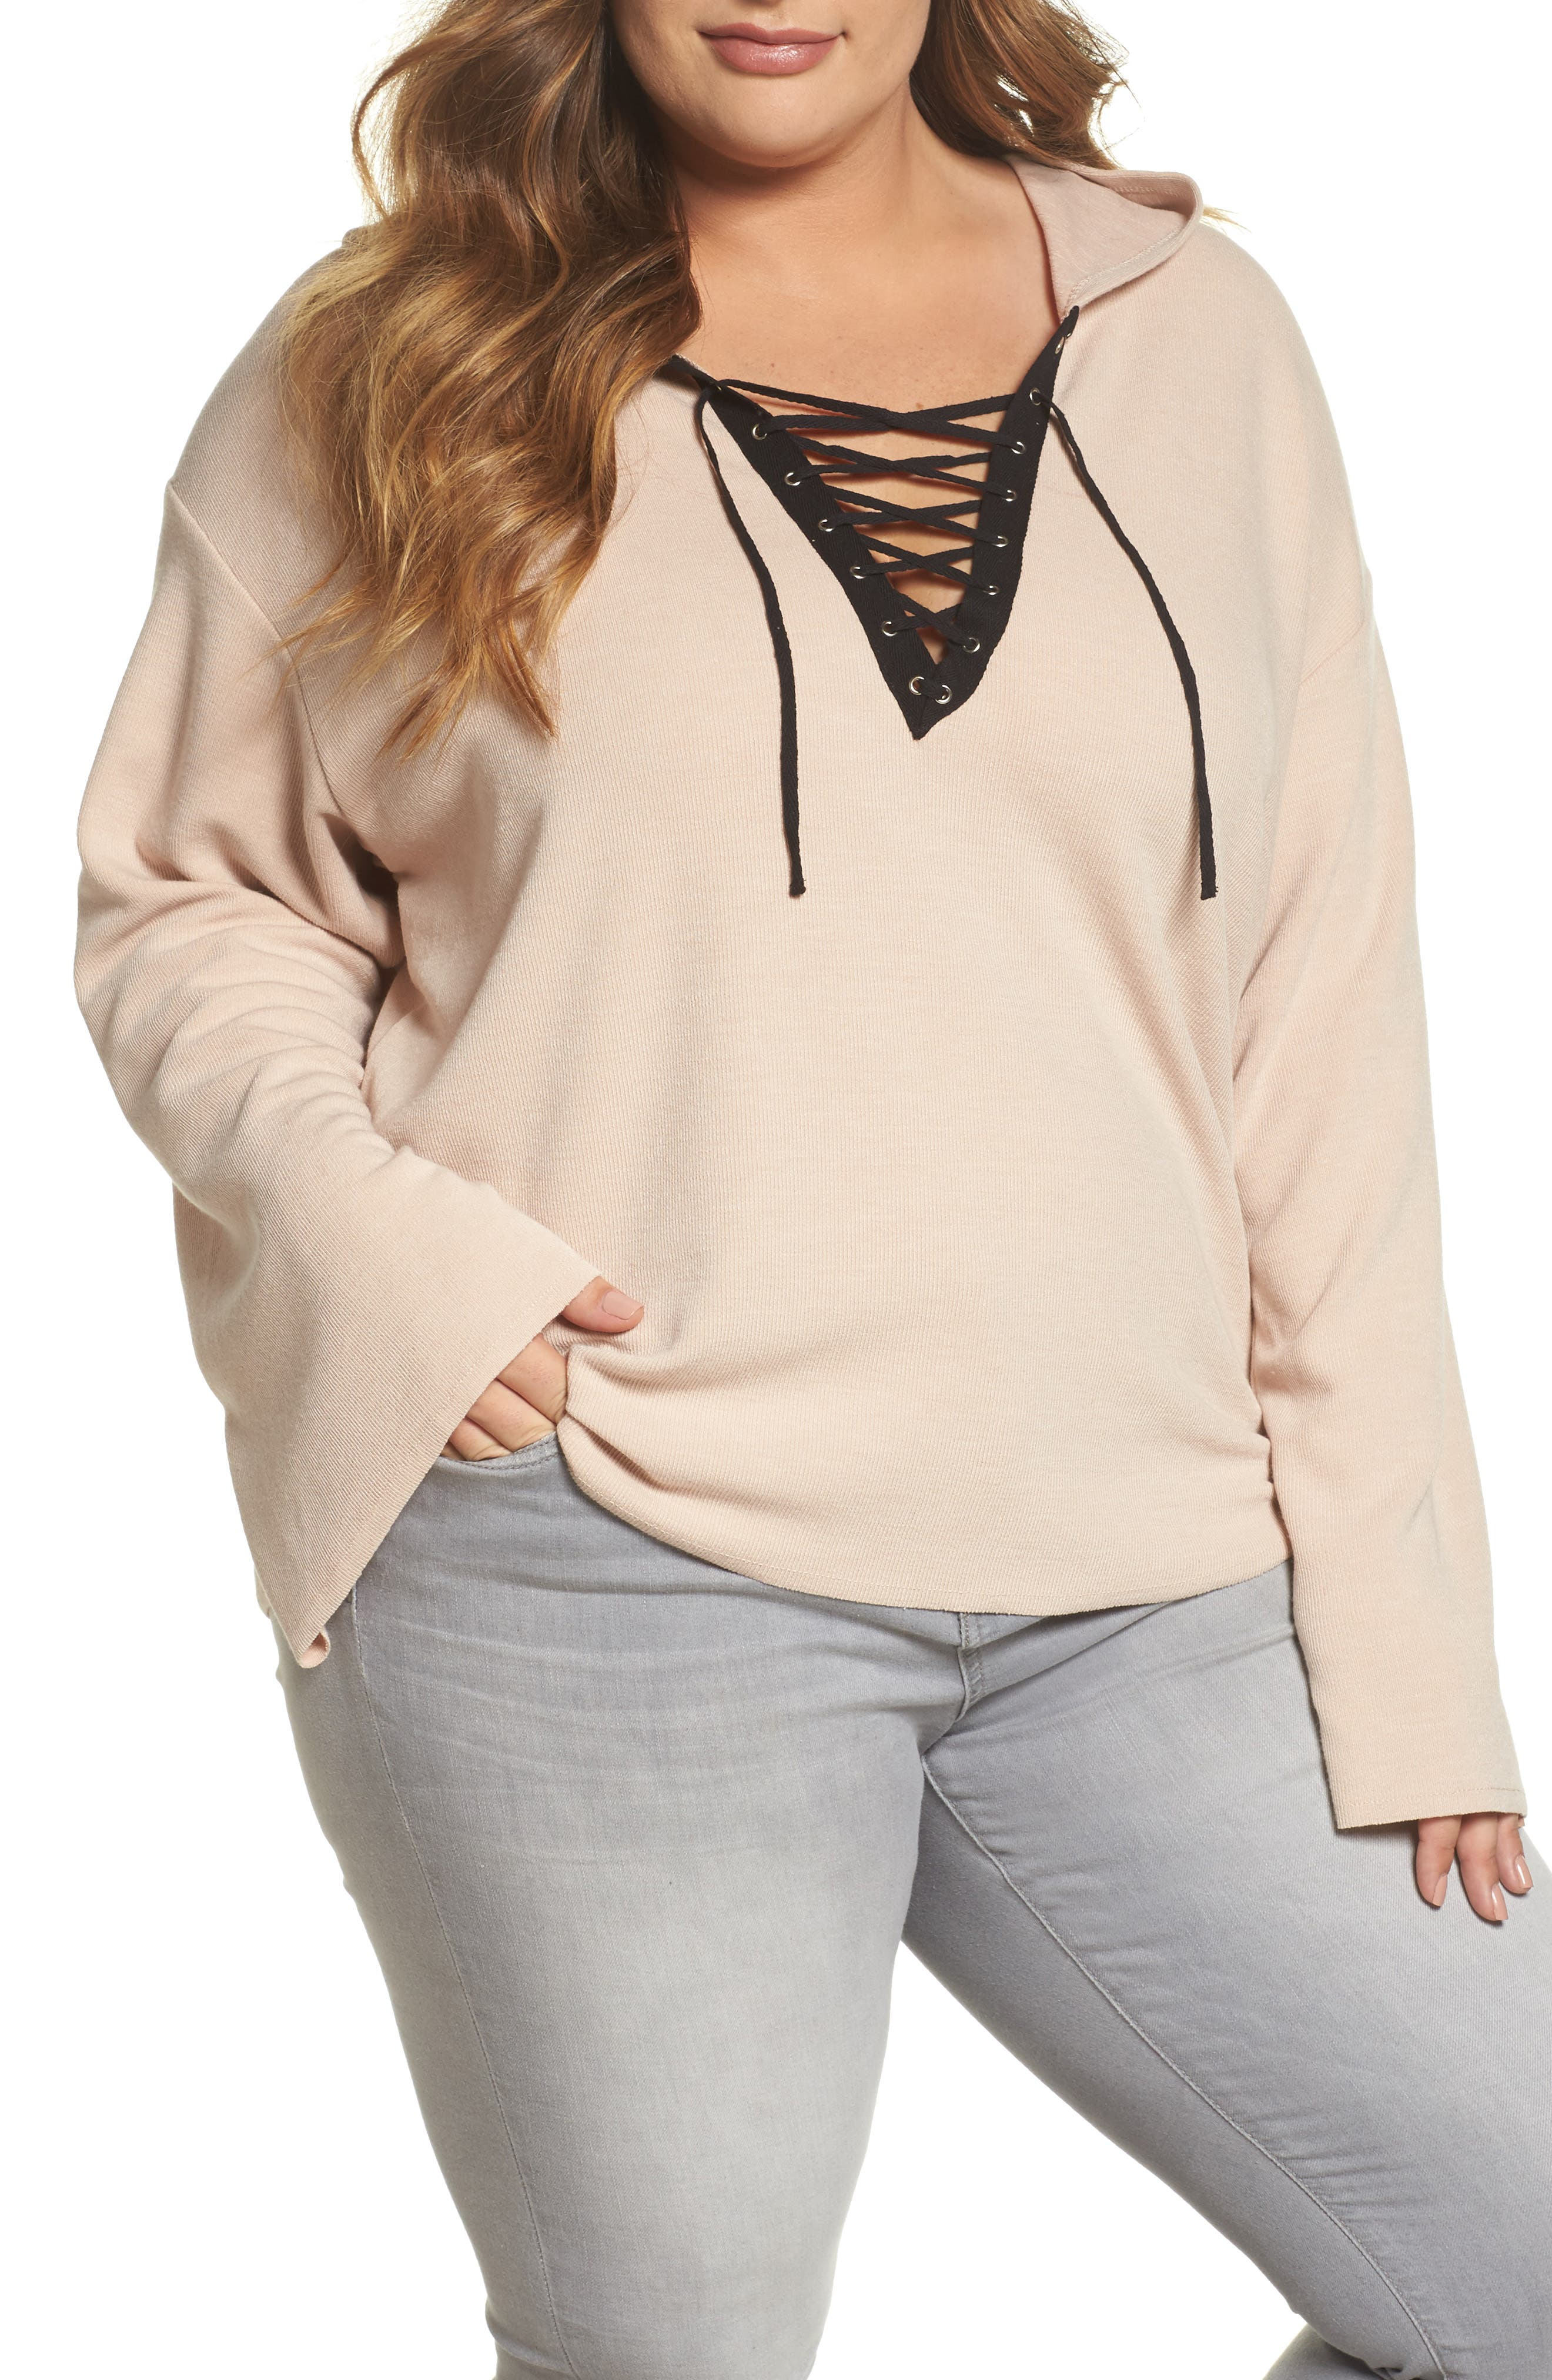 Main Image - Glamorous Lace-Up Hoodie (Plus Size)